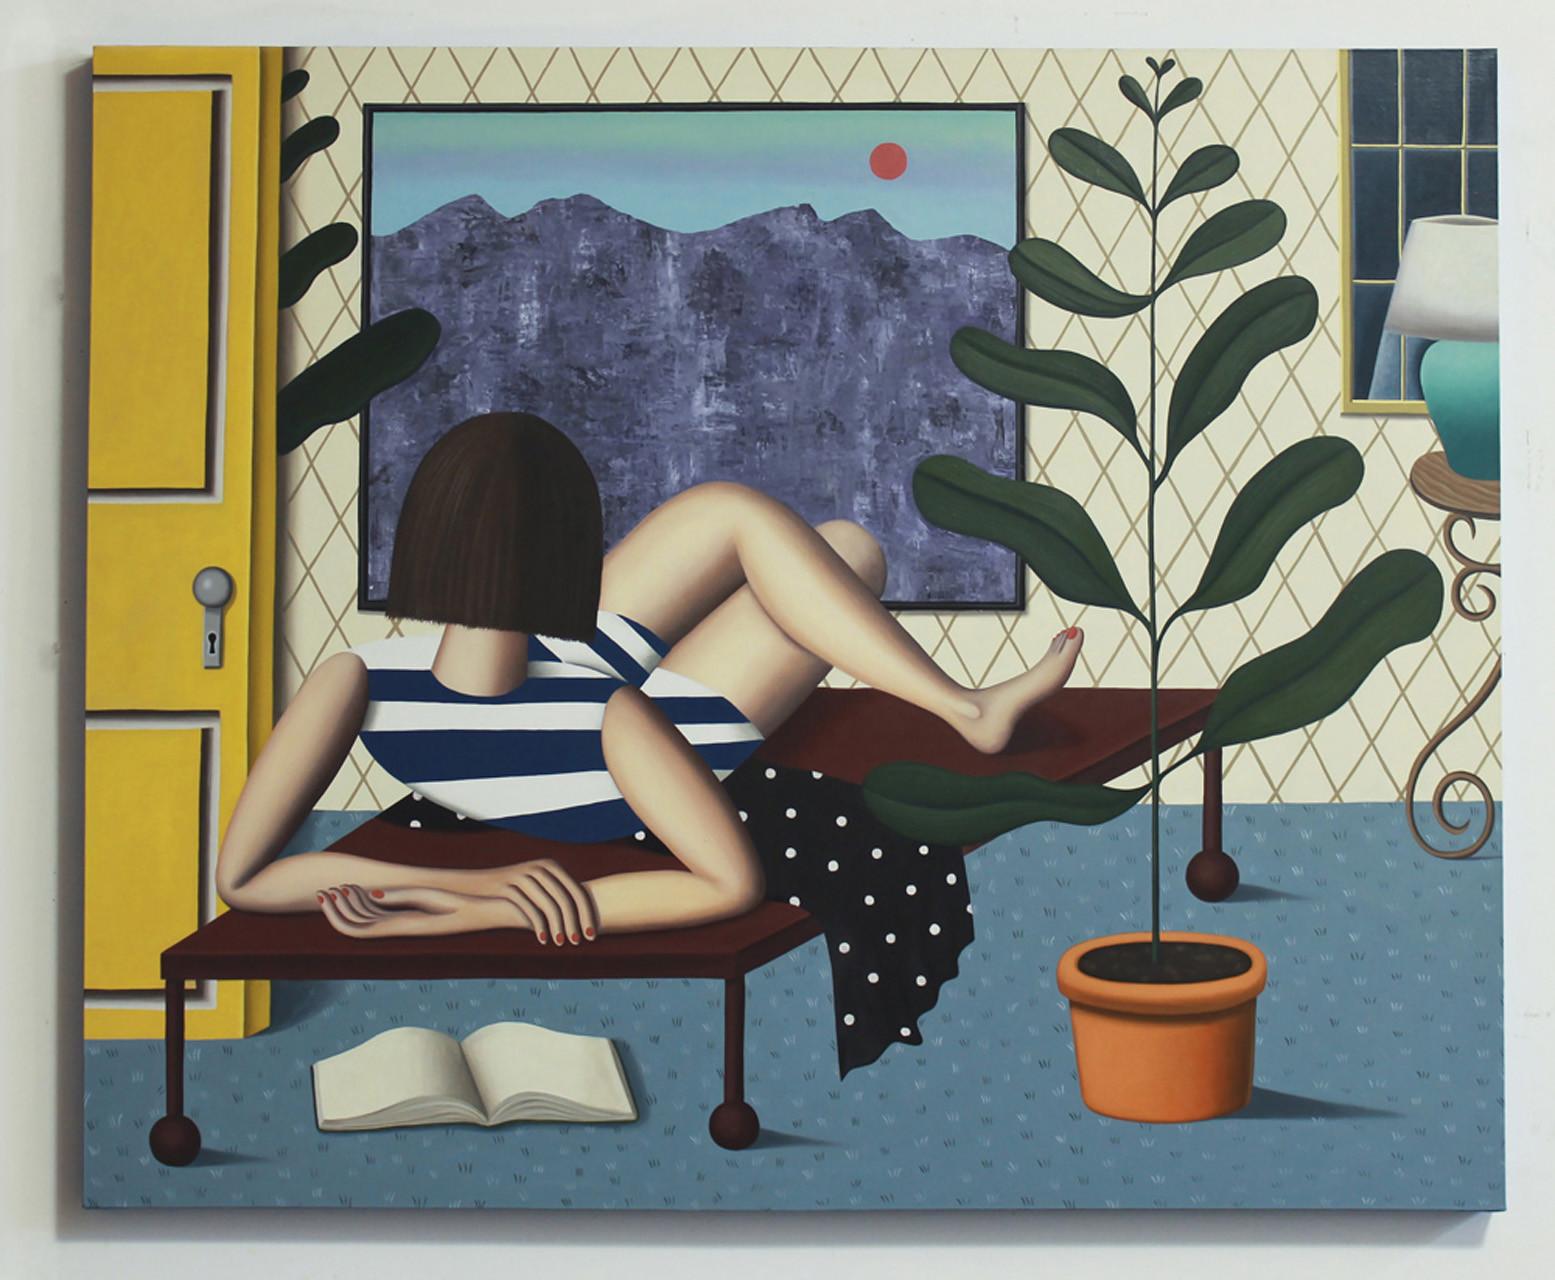 "<div class=""artwork_caption""><p>Jonathan Gardner, Interior Landscape, 2015</p></div>"